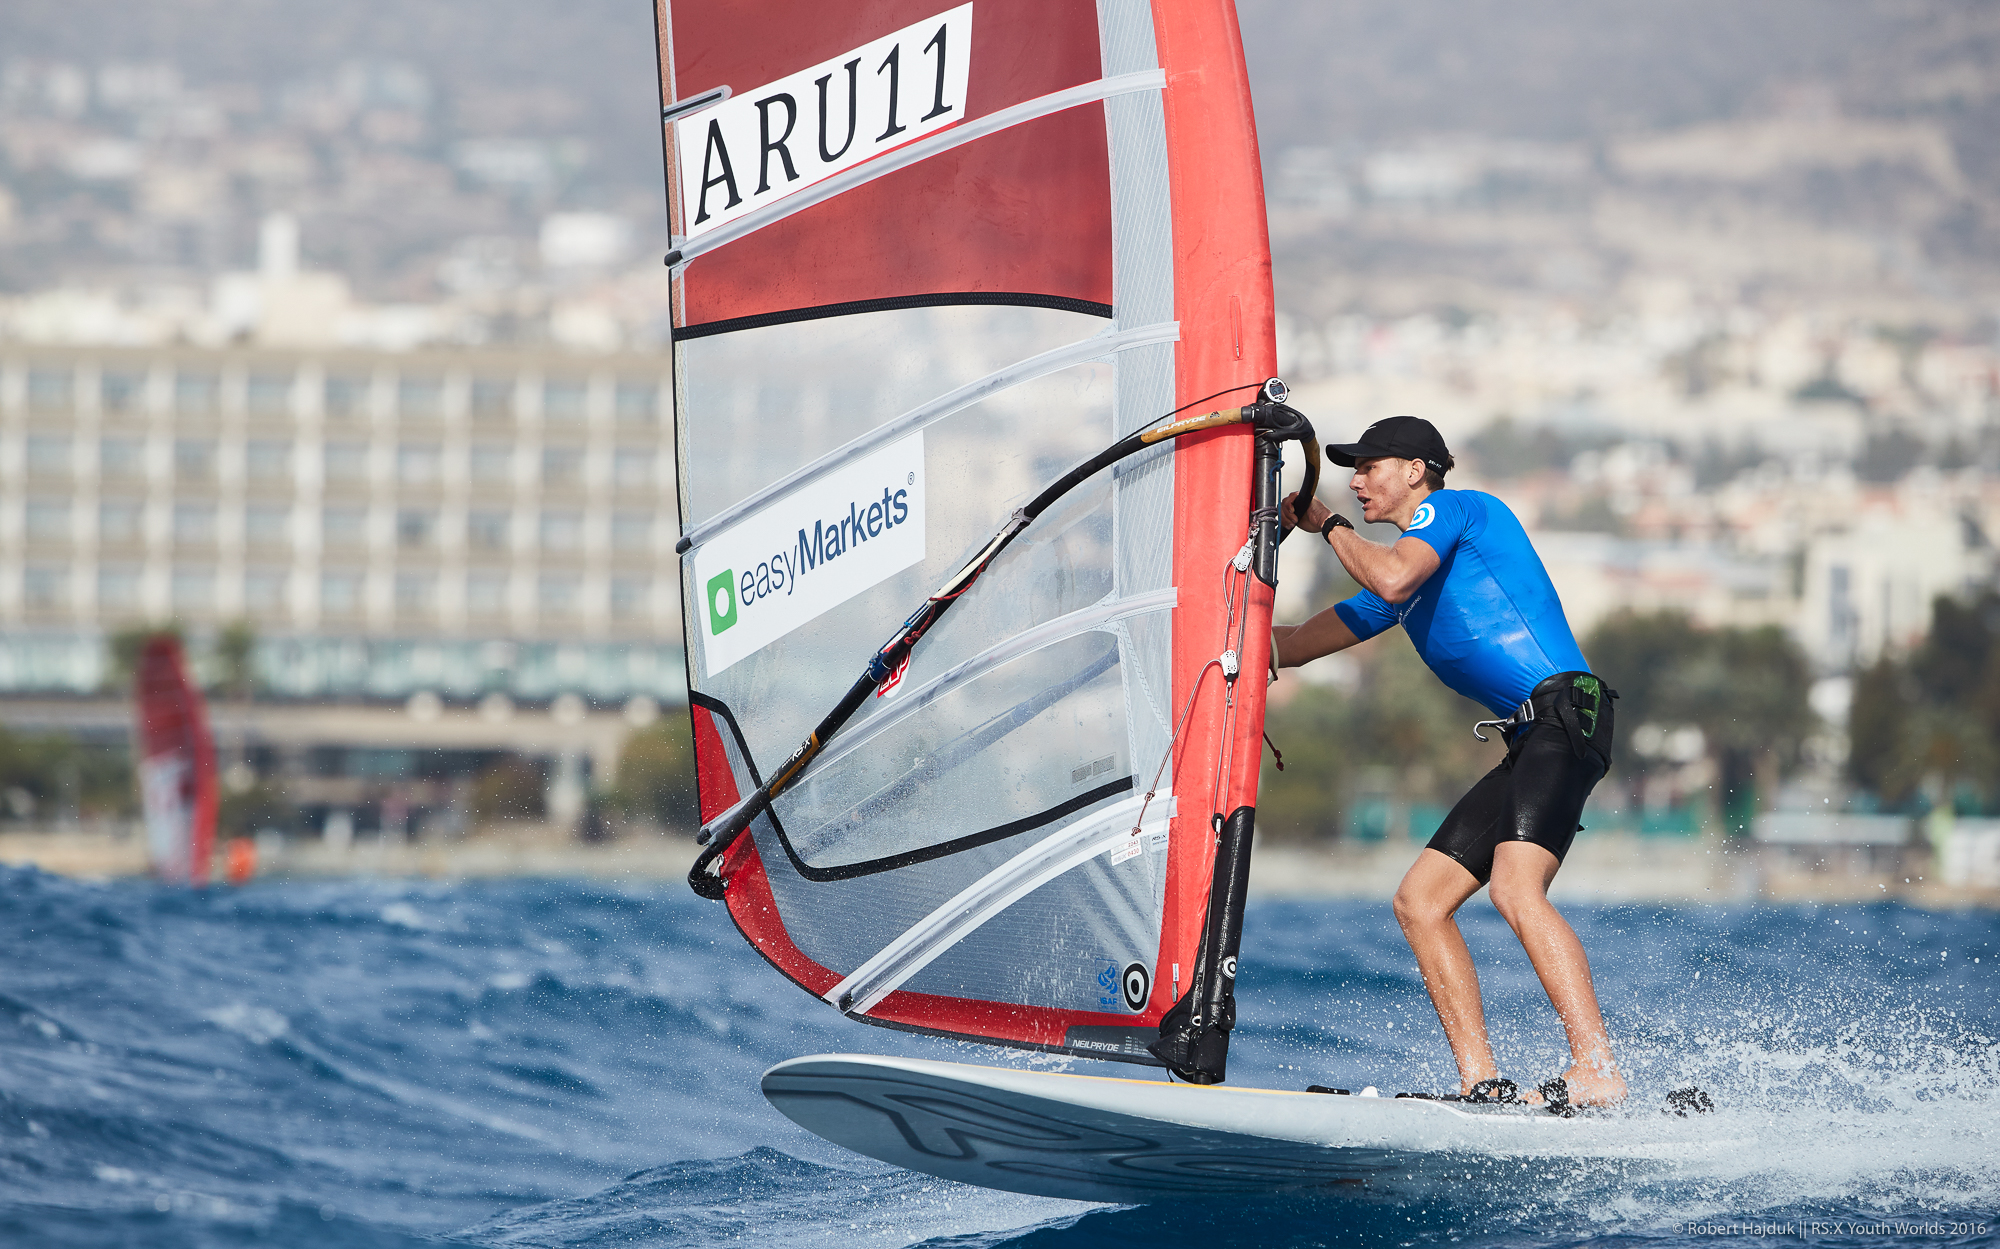 RS:X Youth World Championship || 2016-11-22, Limassol, Cyprus || © Copyright 2016 || Robert Hajduk - ShutterSail.com || All Rights Reserved ||